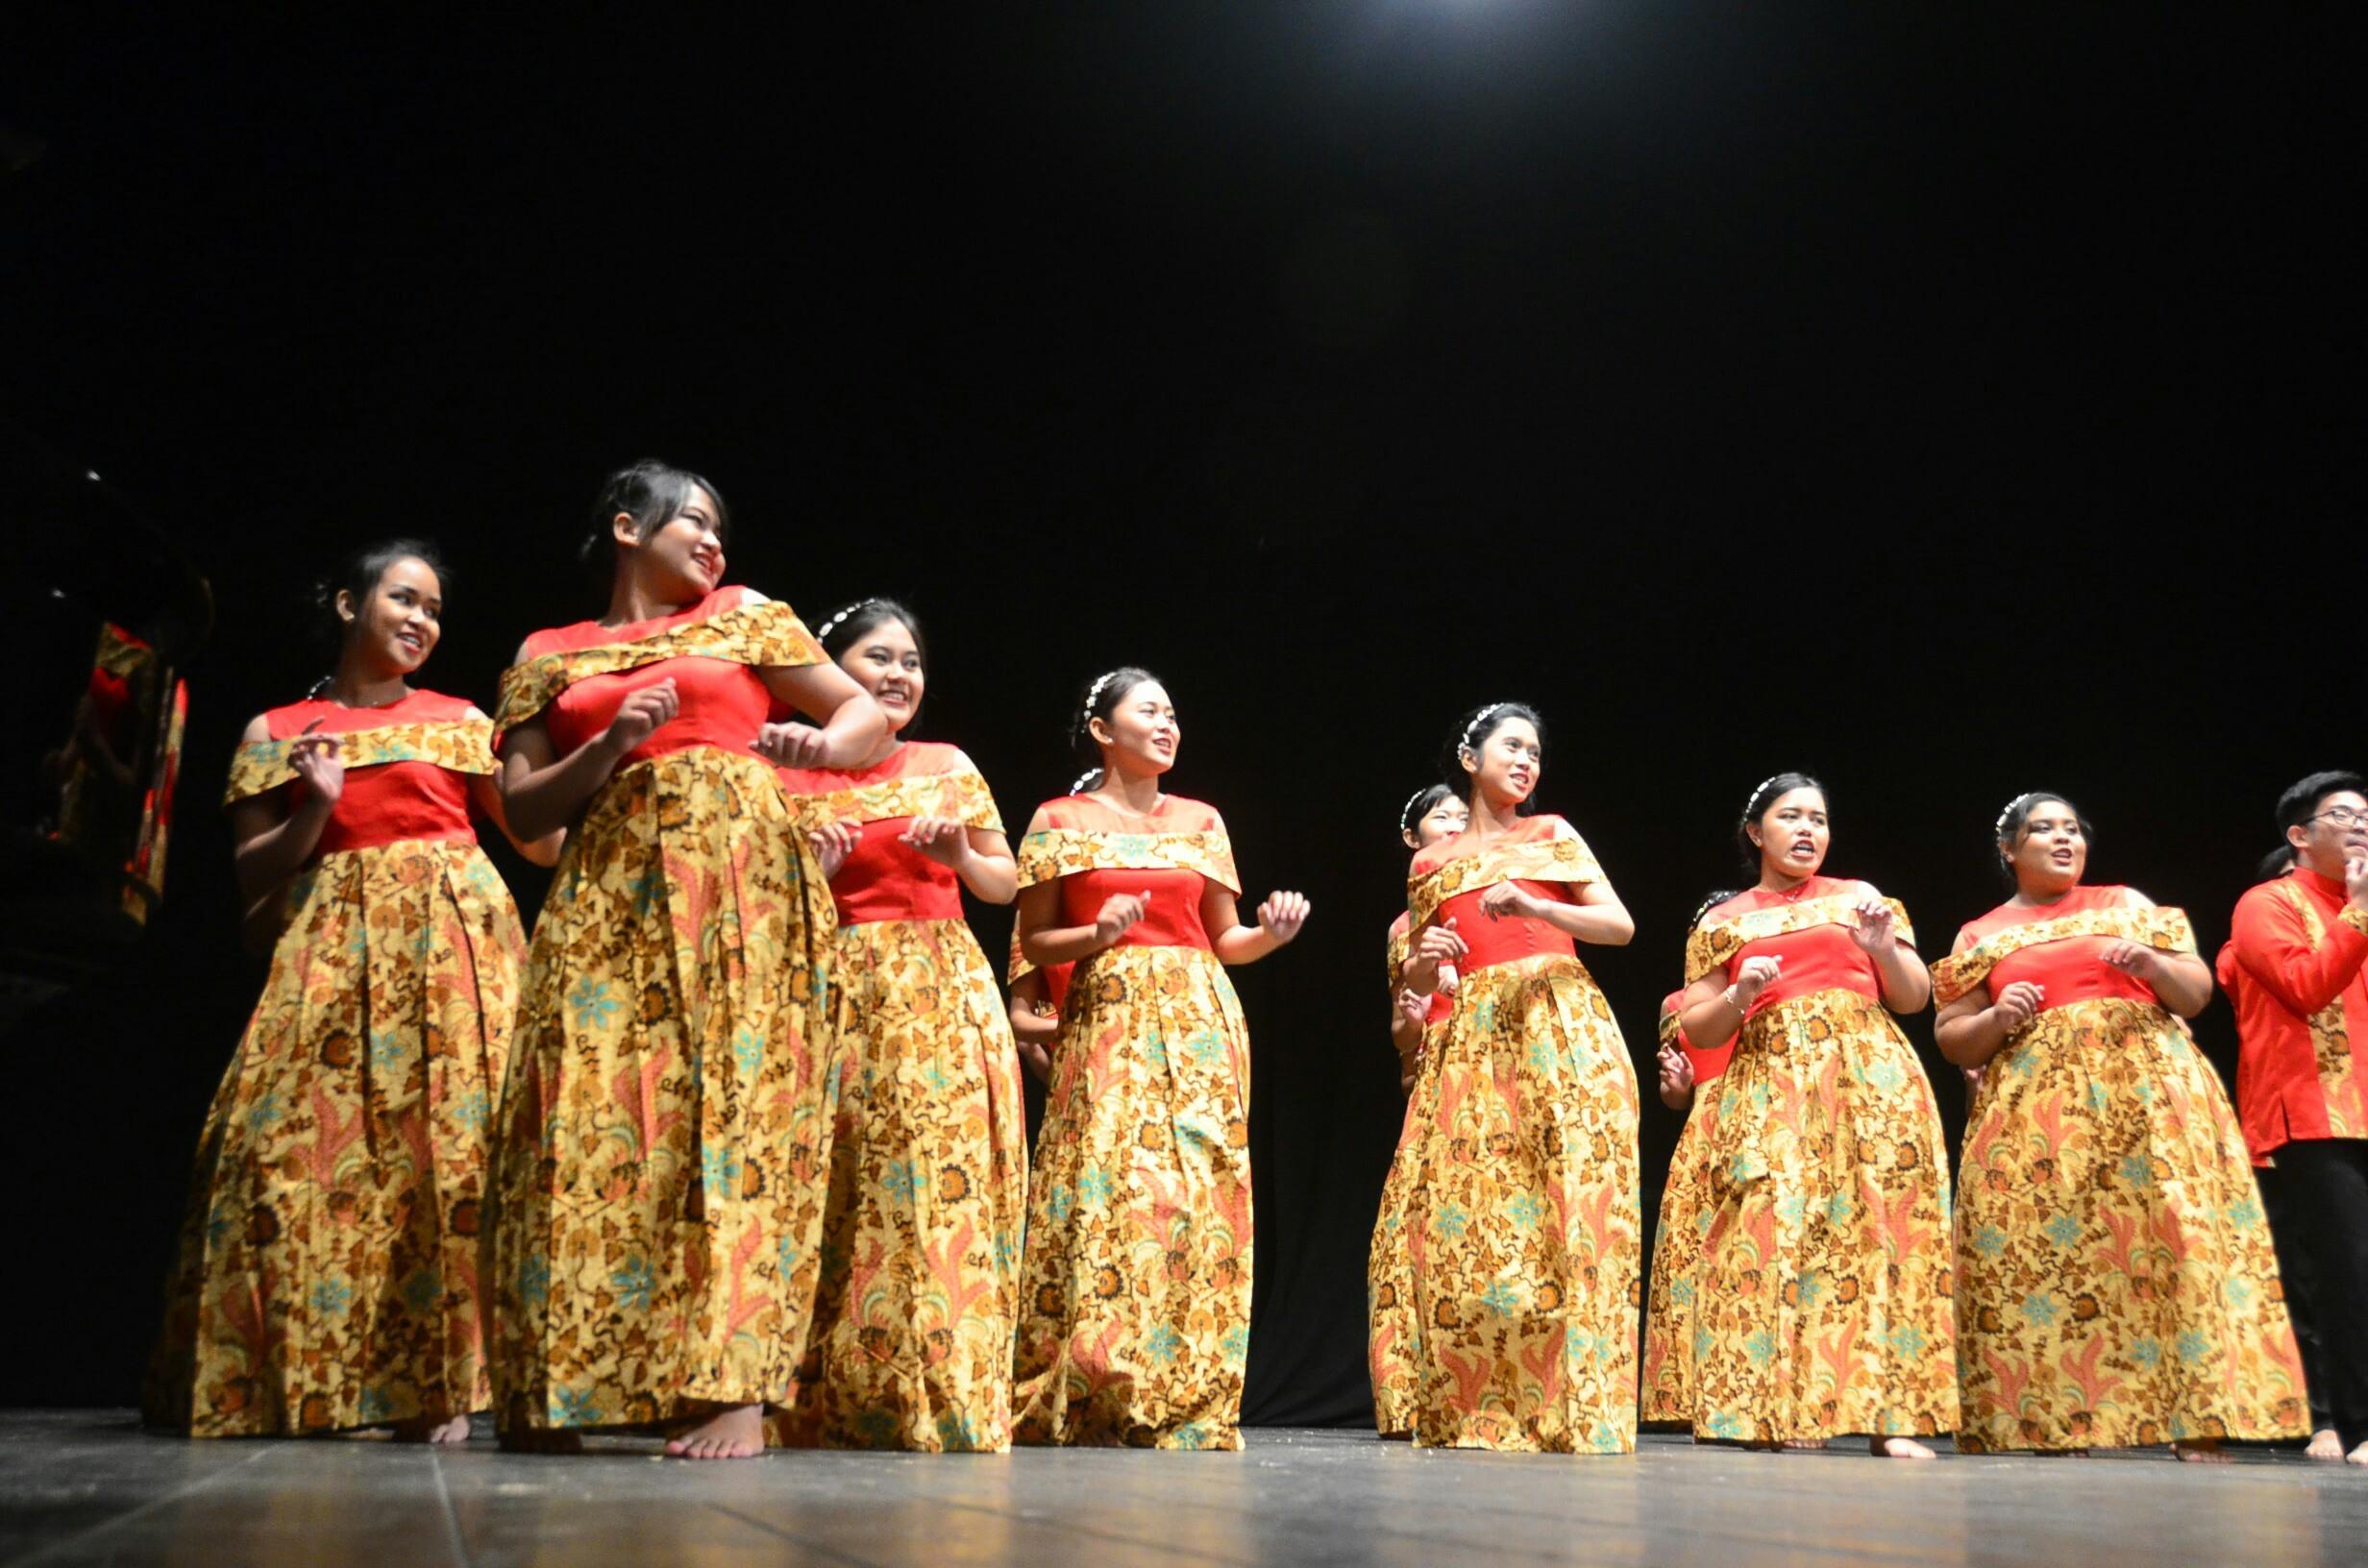 PSM Unika Soegijapranata Semarang pada saat membawakan lagu Hela Rotane di 11th Rimini International Choral Festival (RICC) Italia